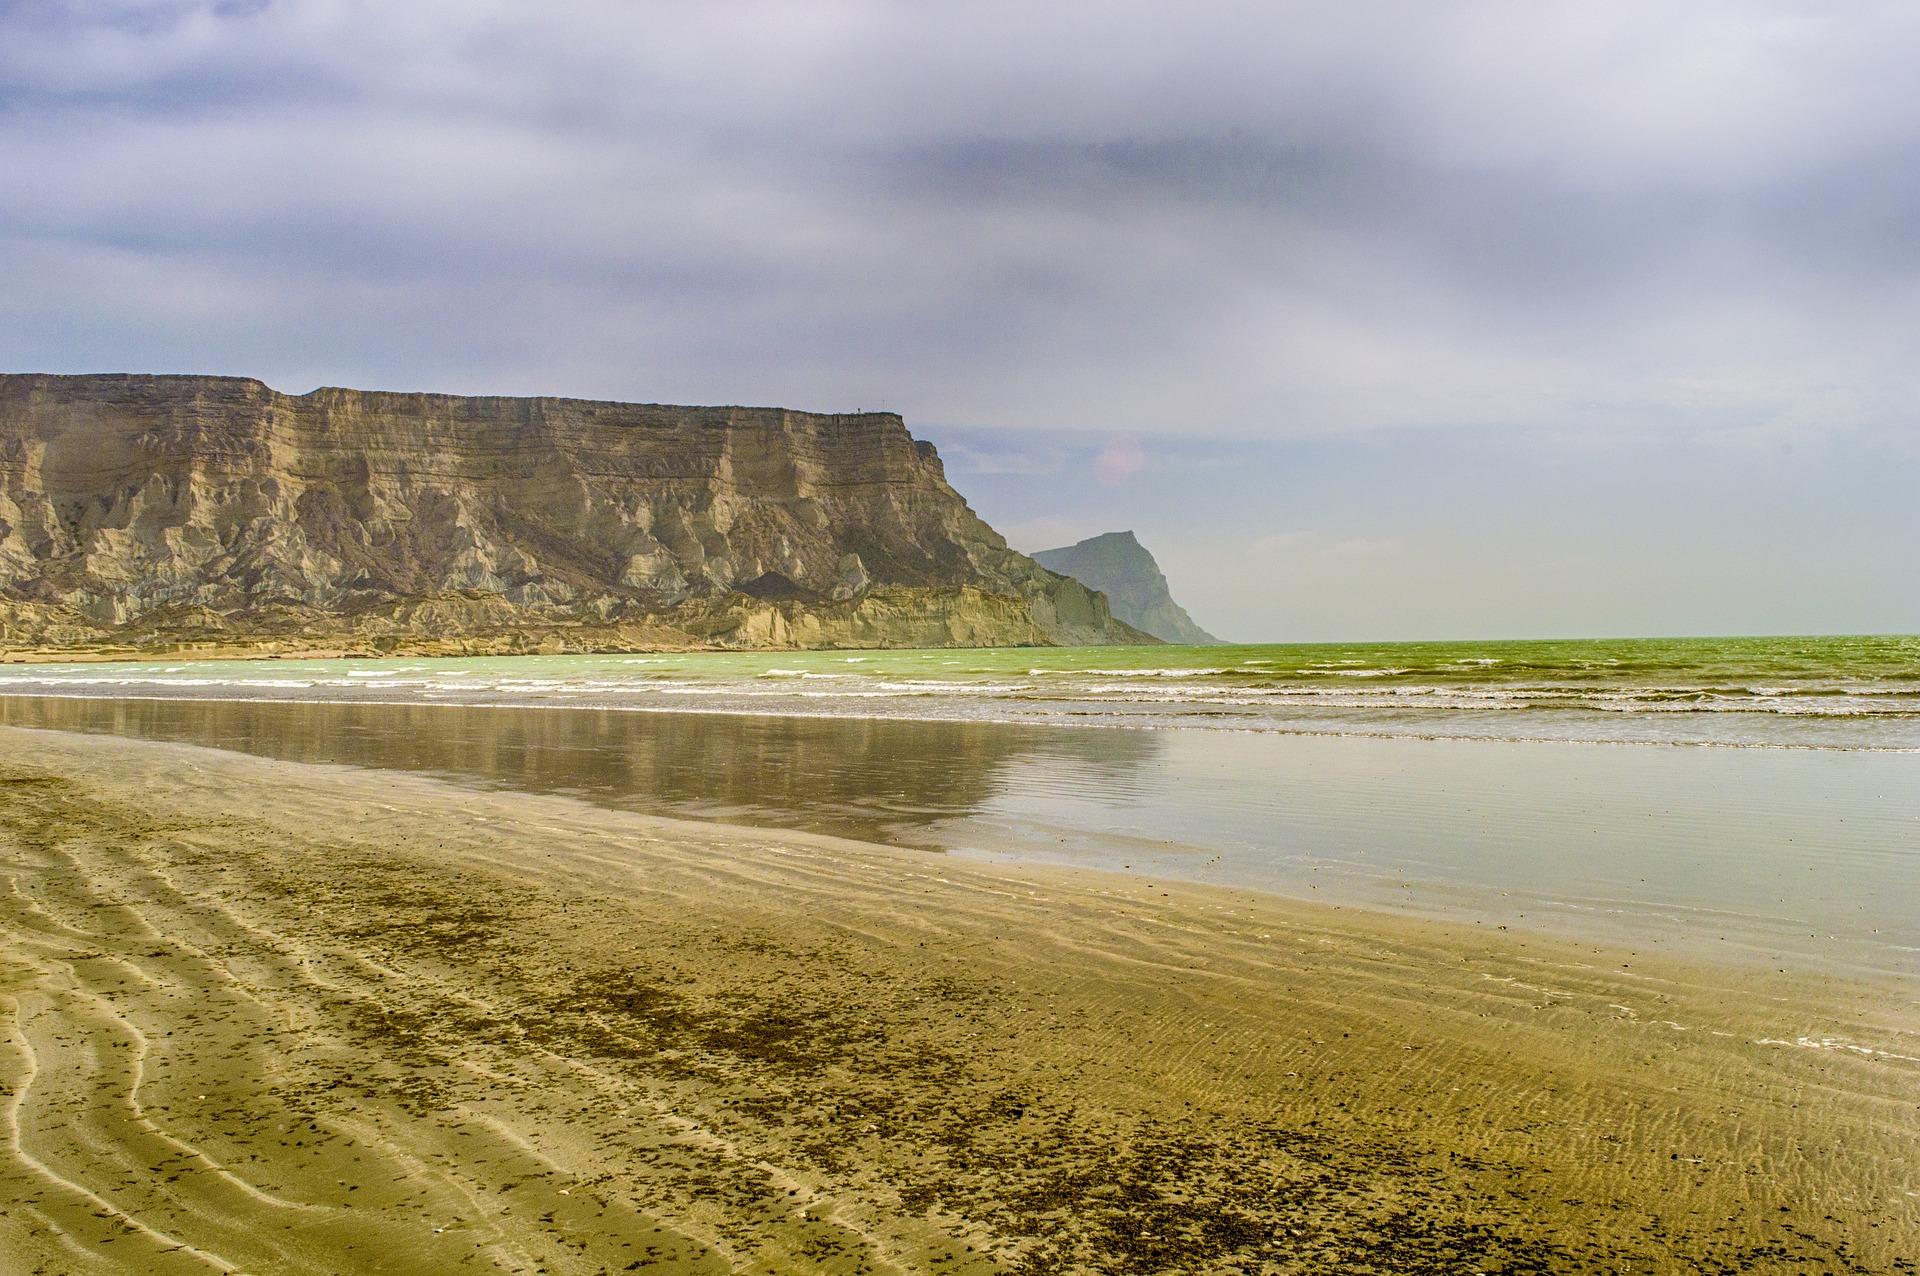 Things to explore in Pakistan - Kund Malir Beach